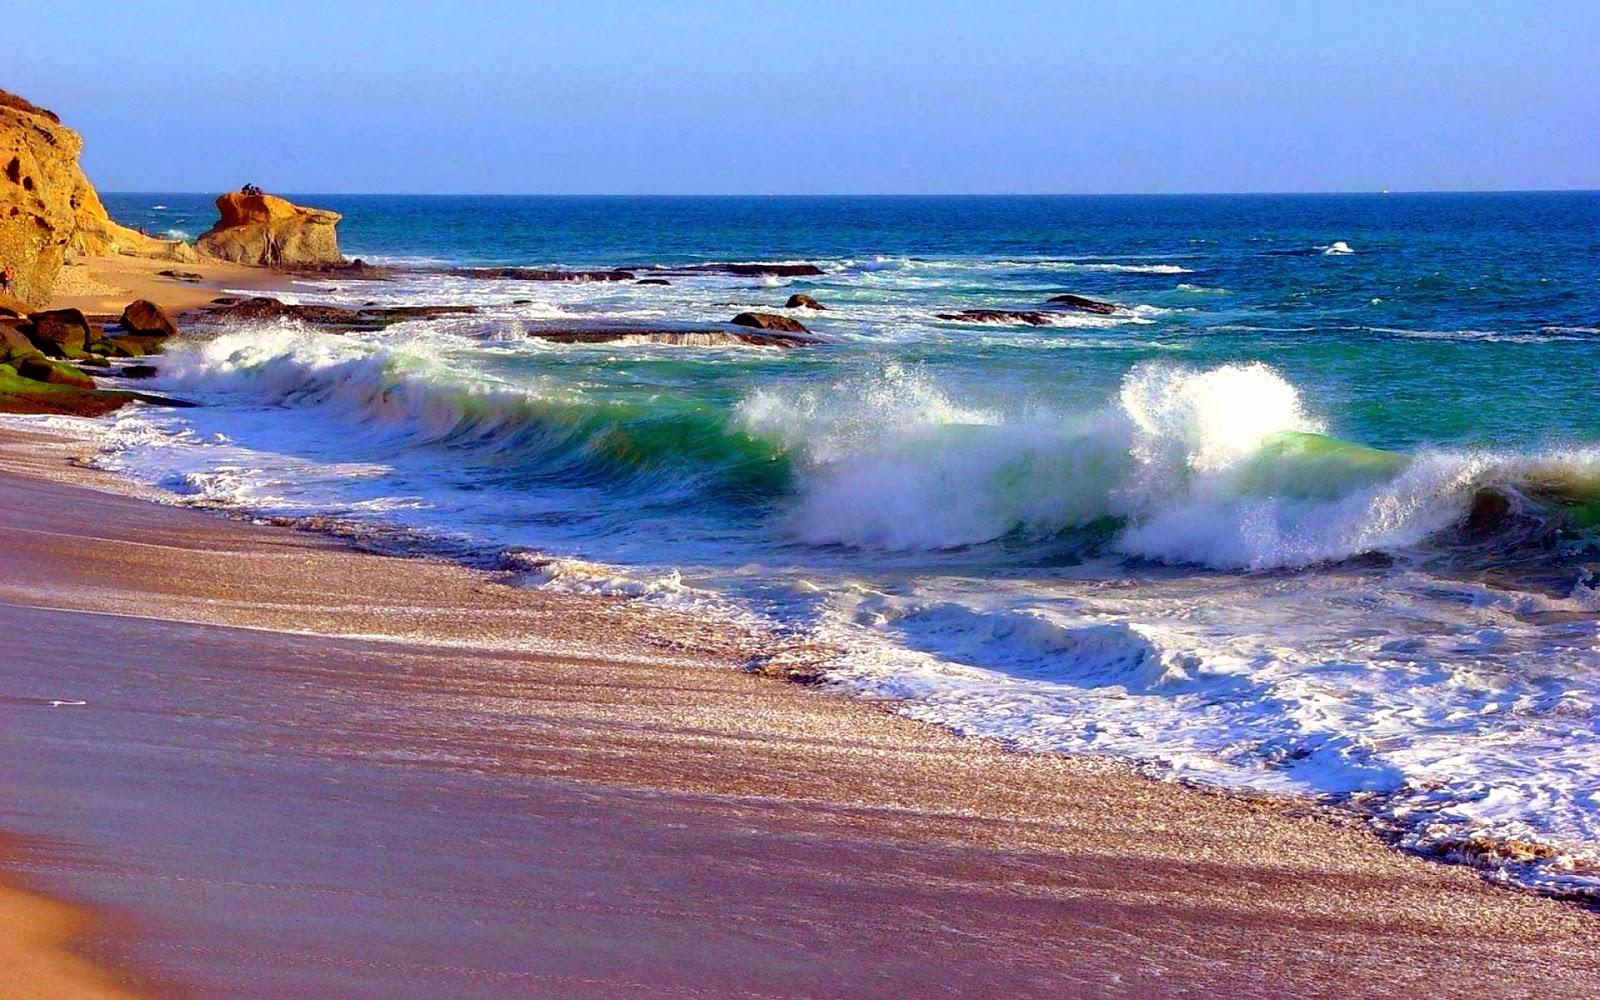 Ocean Waves Wallpaper HD Wallpapers 1600x1000